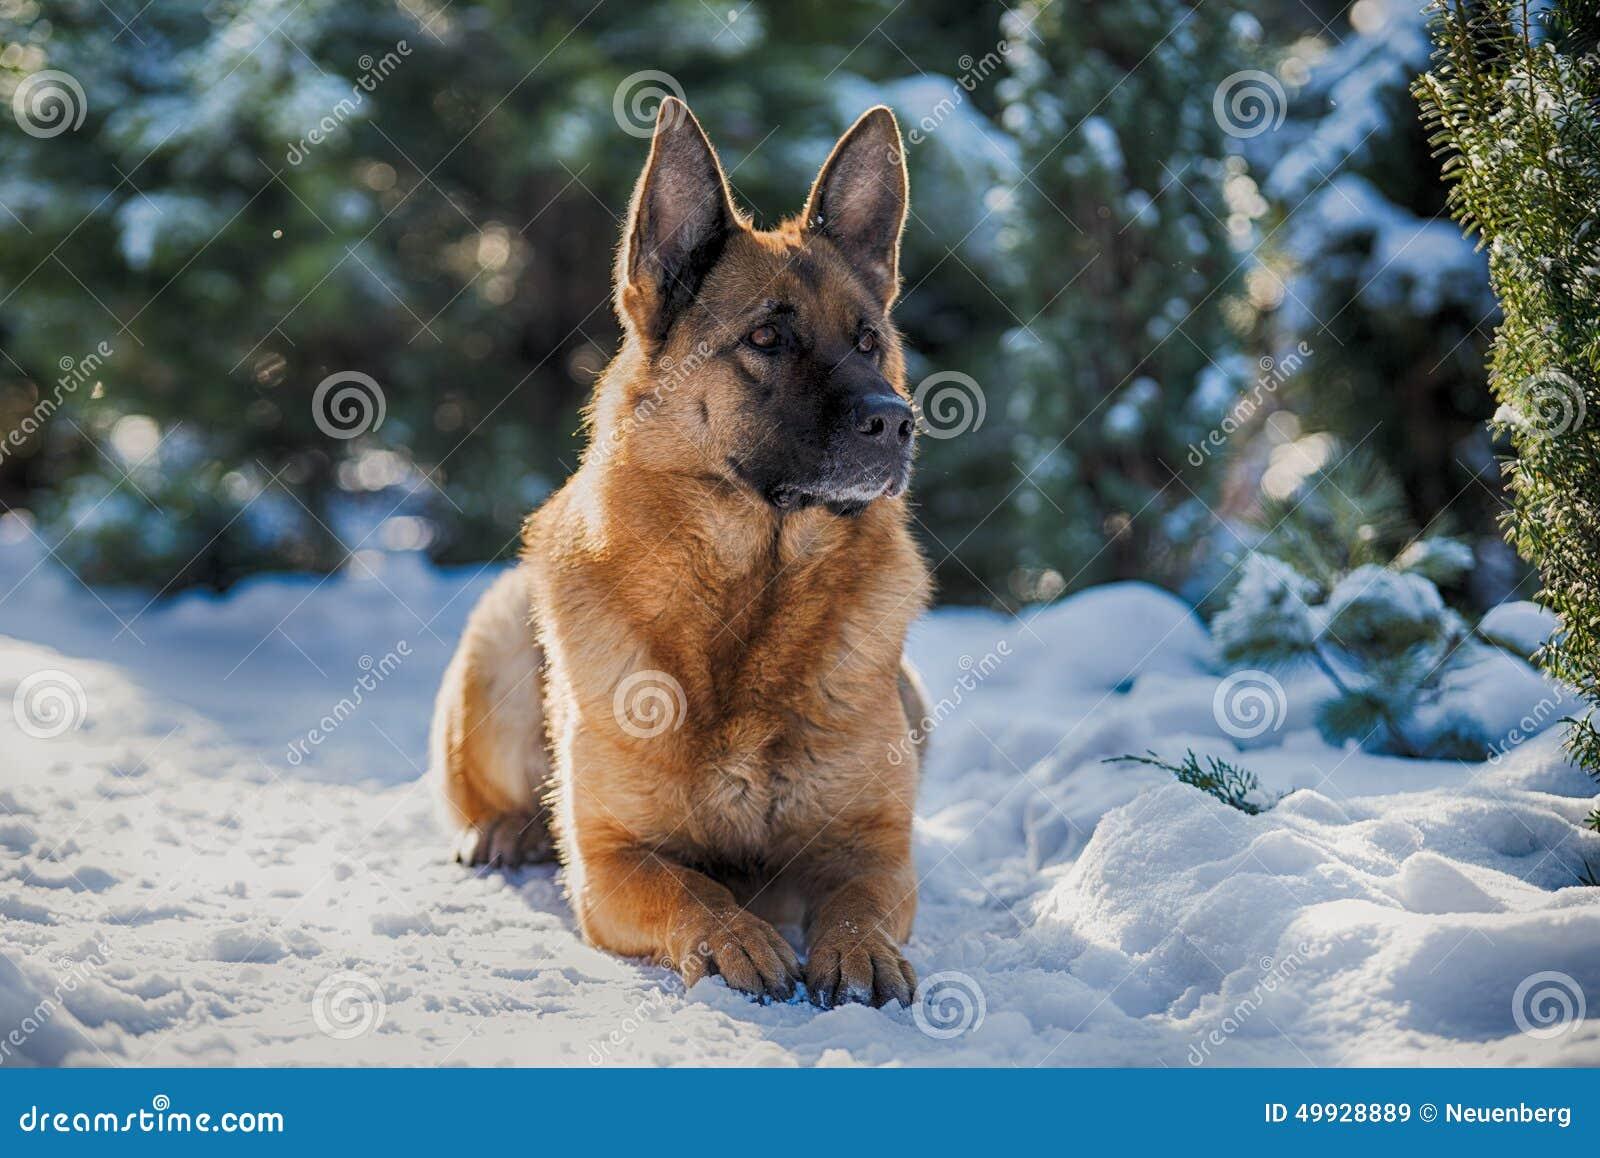 Beautiful Shepherd Lying On The White Snow Royalty-Free ...